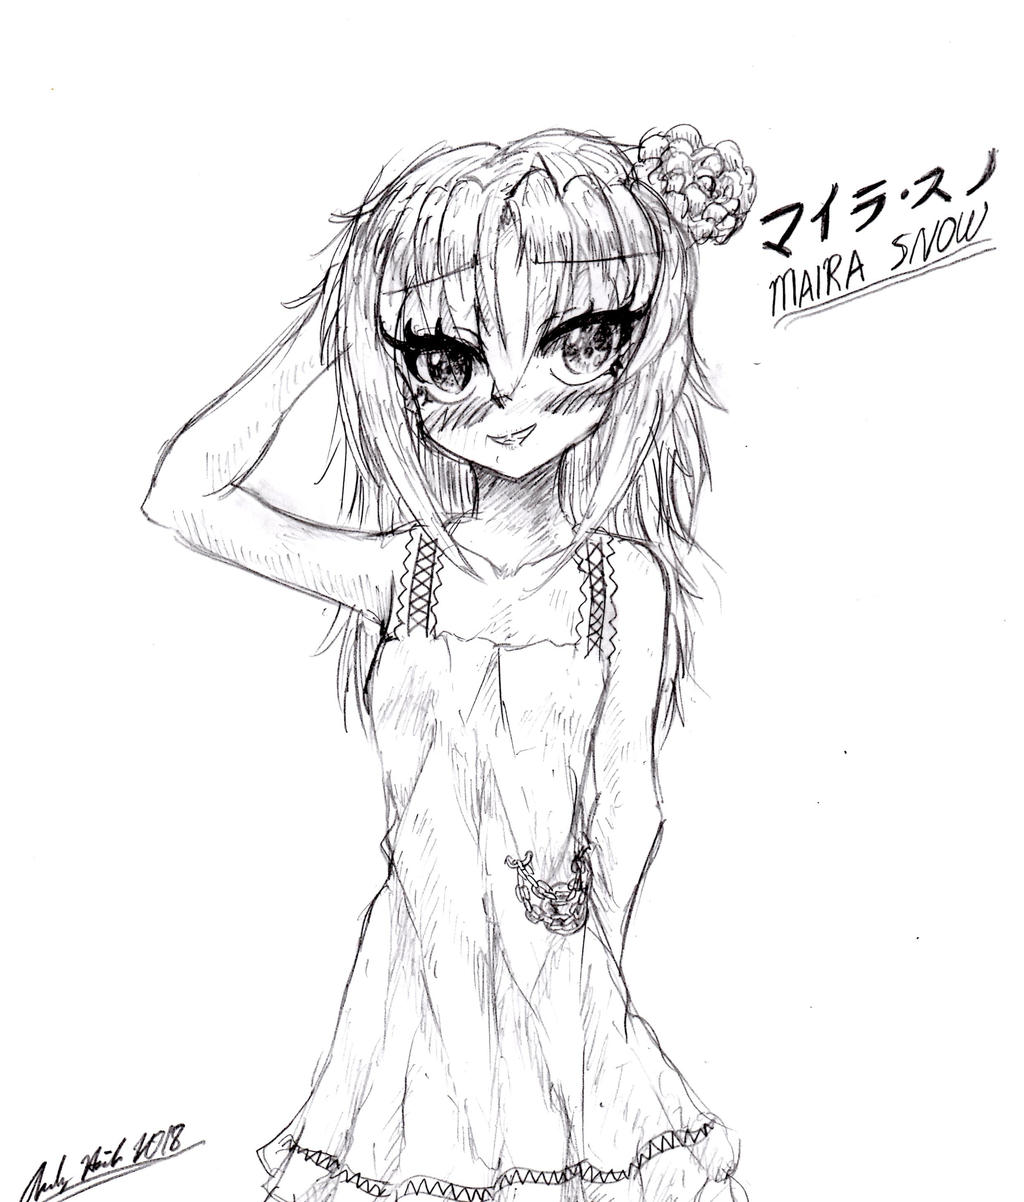 Drunk Maira Sketch by Candor-Shade